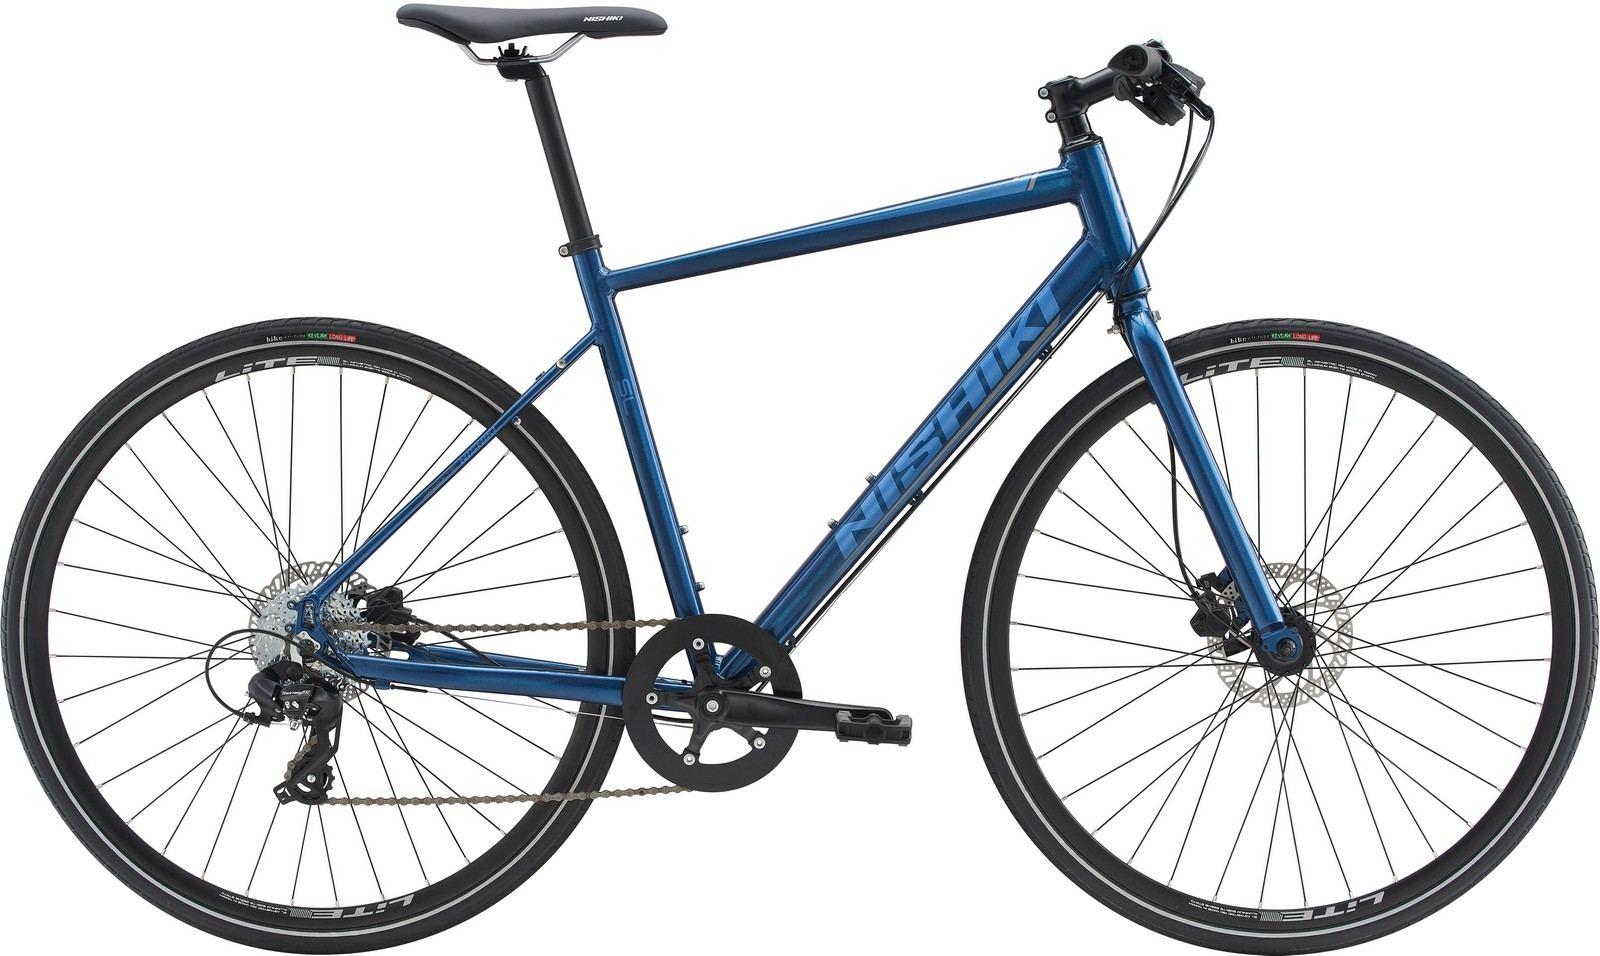 Nishiki SL, Herre sportscykel, 2019, Blå | City-cykler